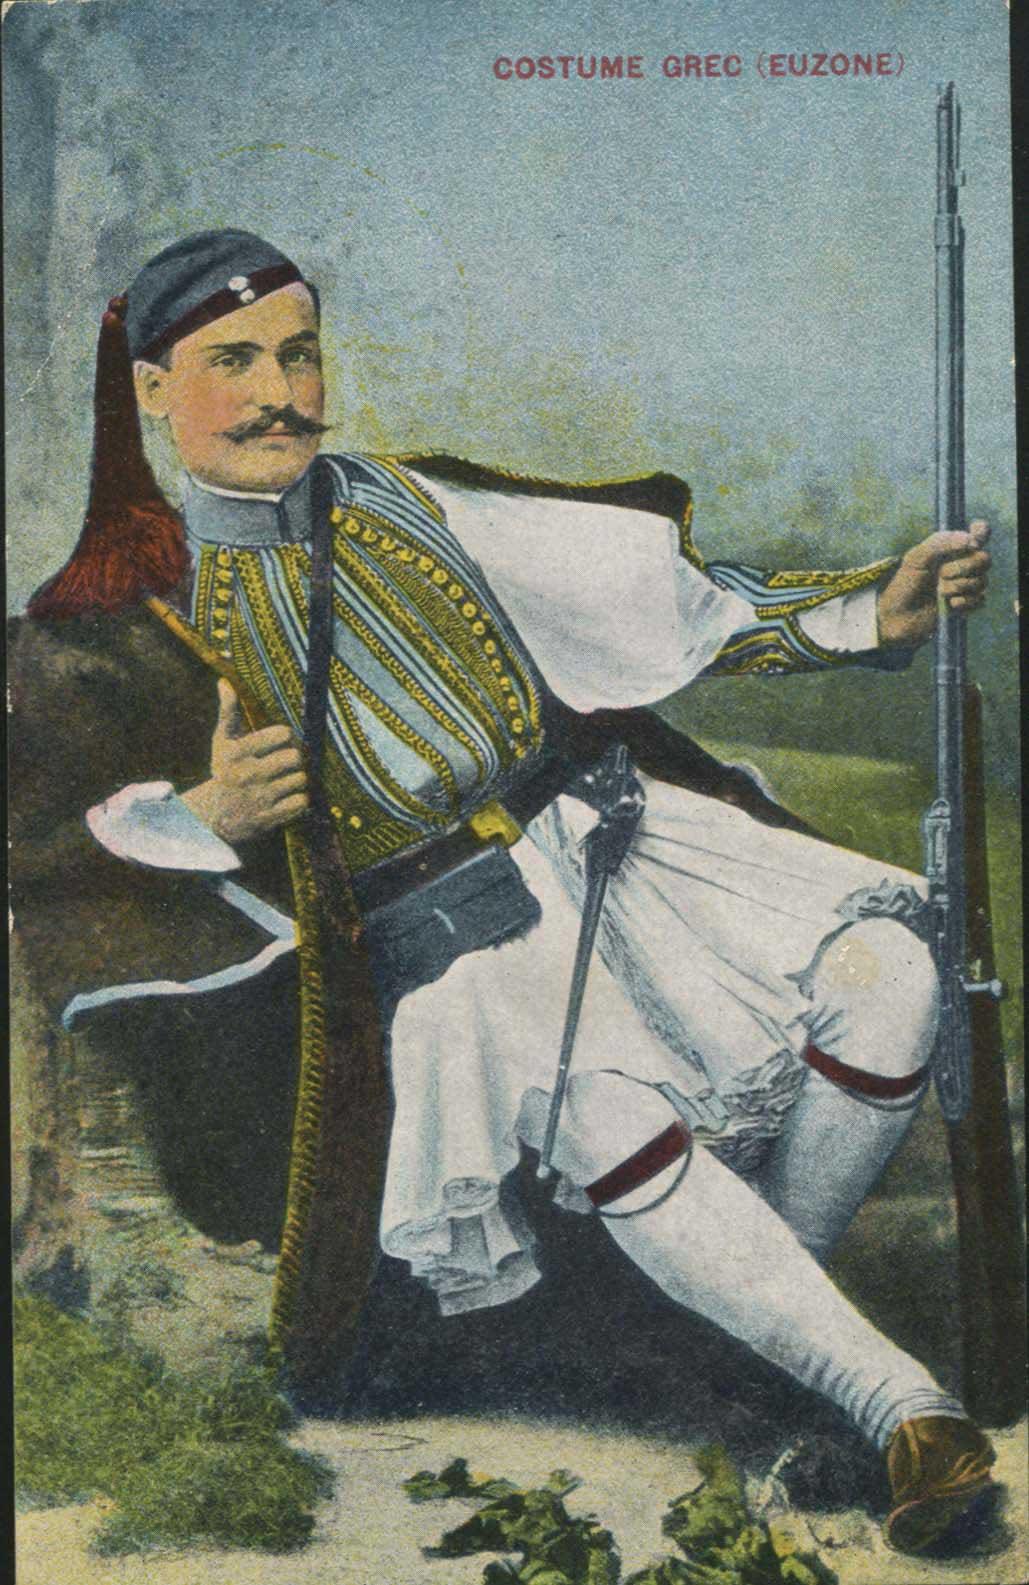 Lot 1564 - -  PICTURE POSTCARDS costumes -  A. Karamitsos Postal & Live Internet Auction 681 General Philatelic Auction